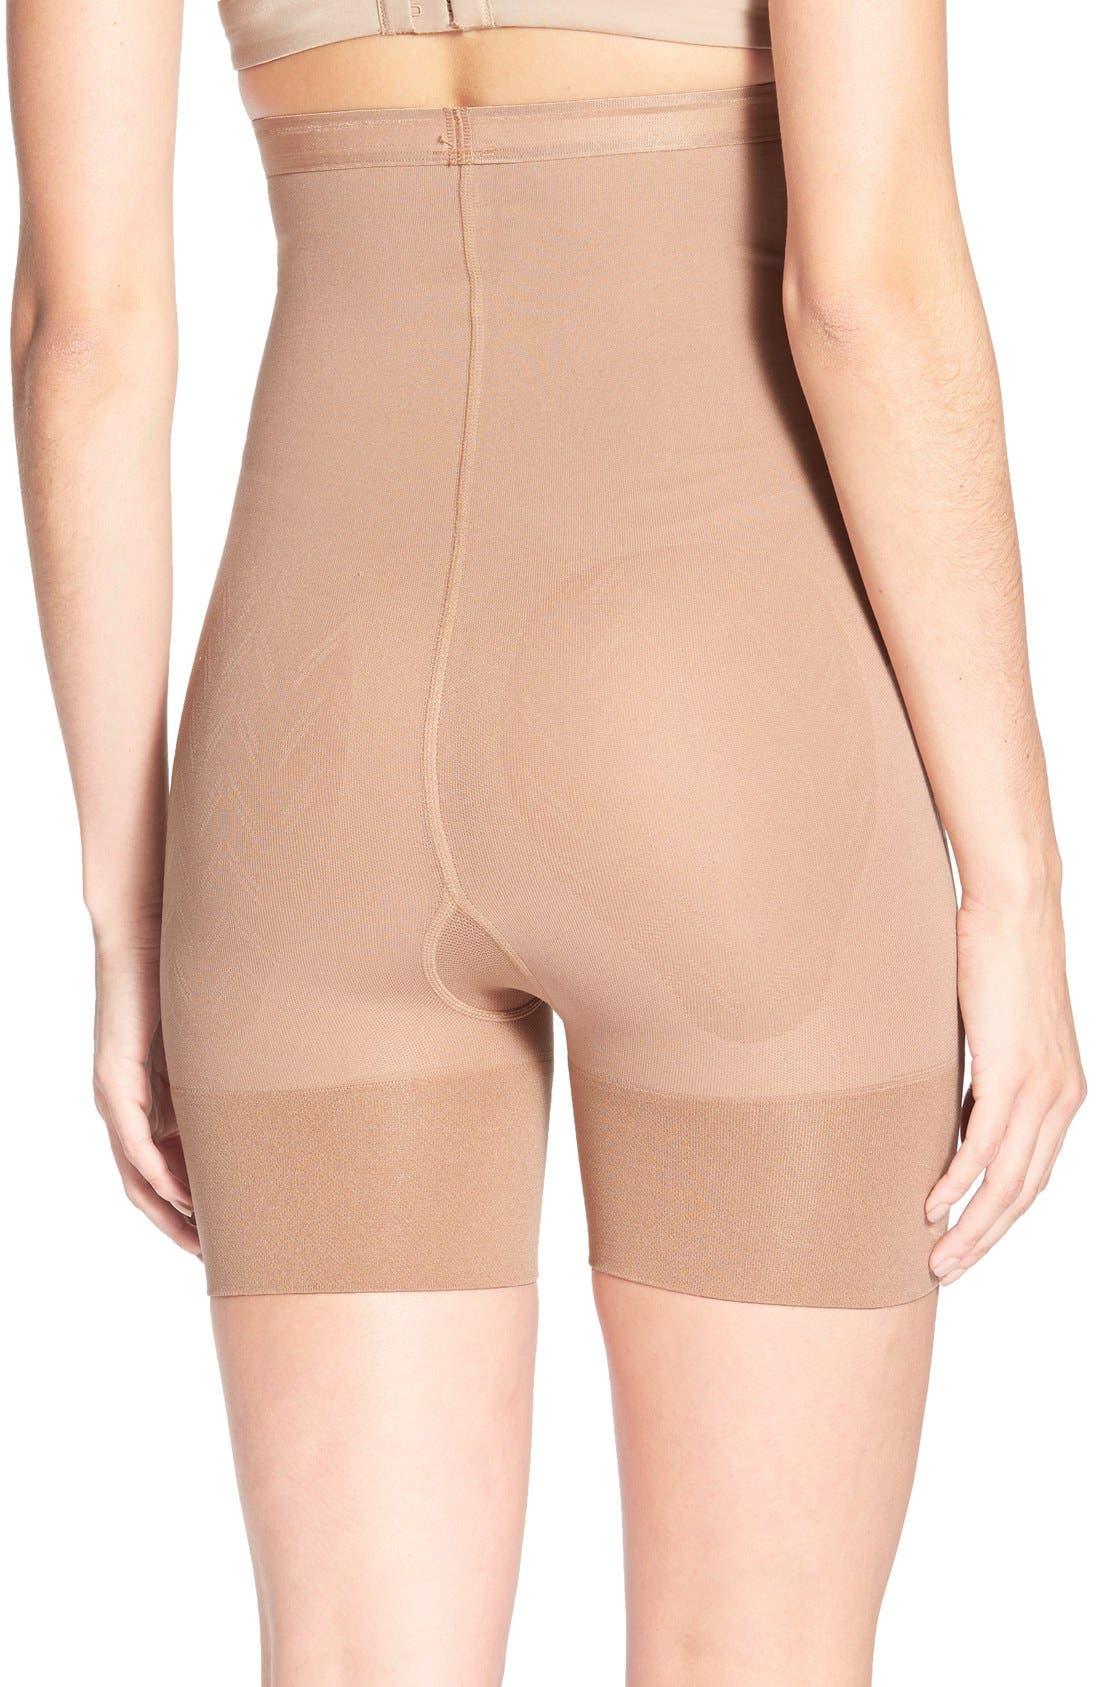 Shorty Shaping Shorts,                             Alternate thumbnail 2, color,                             Caramel